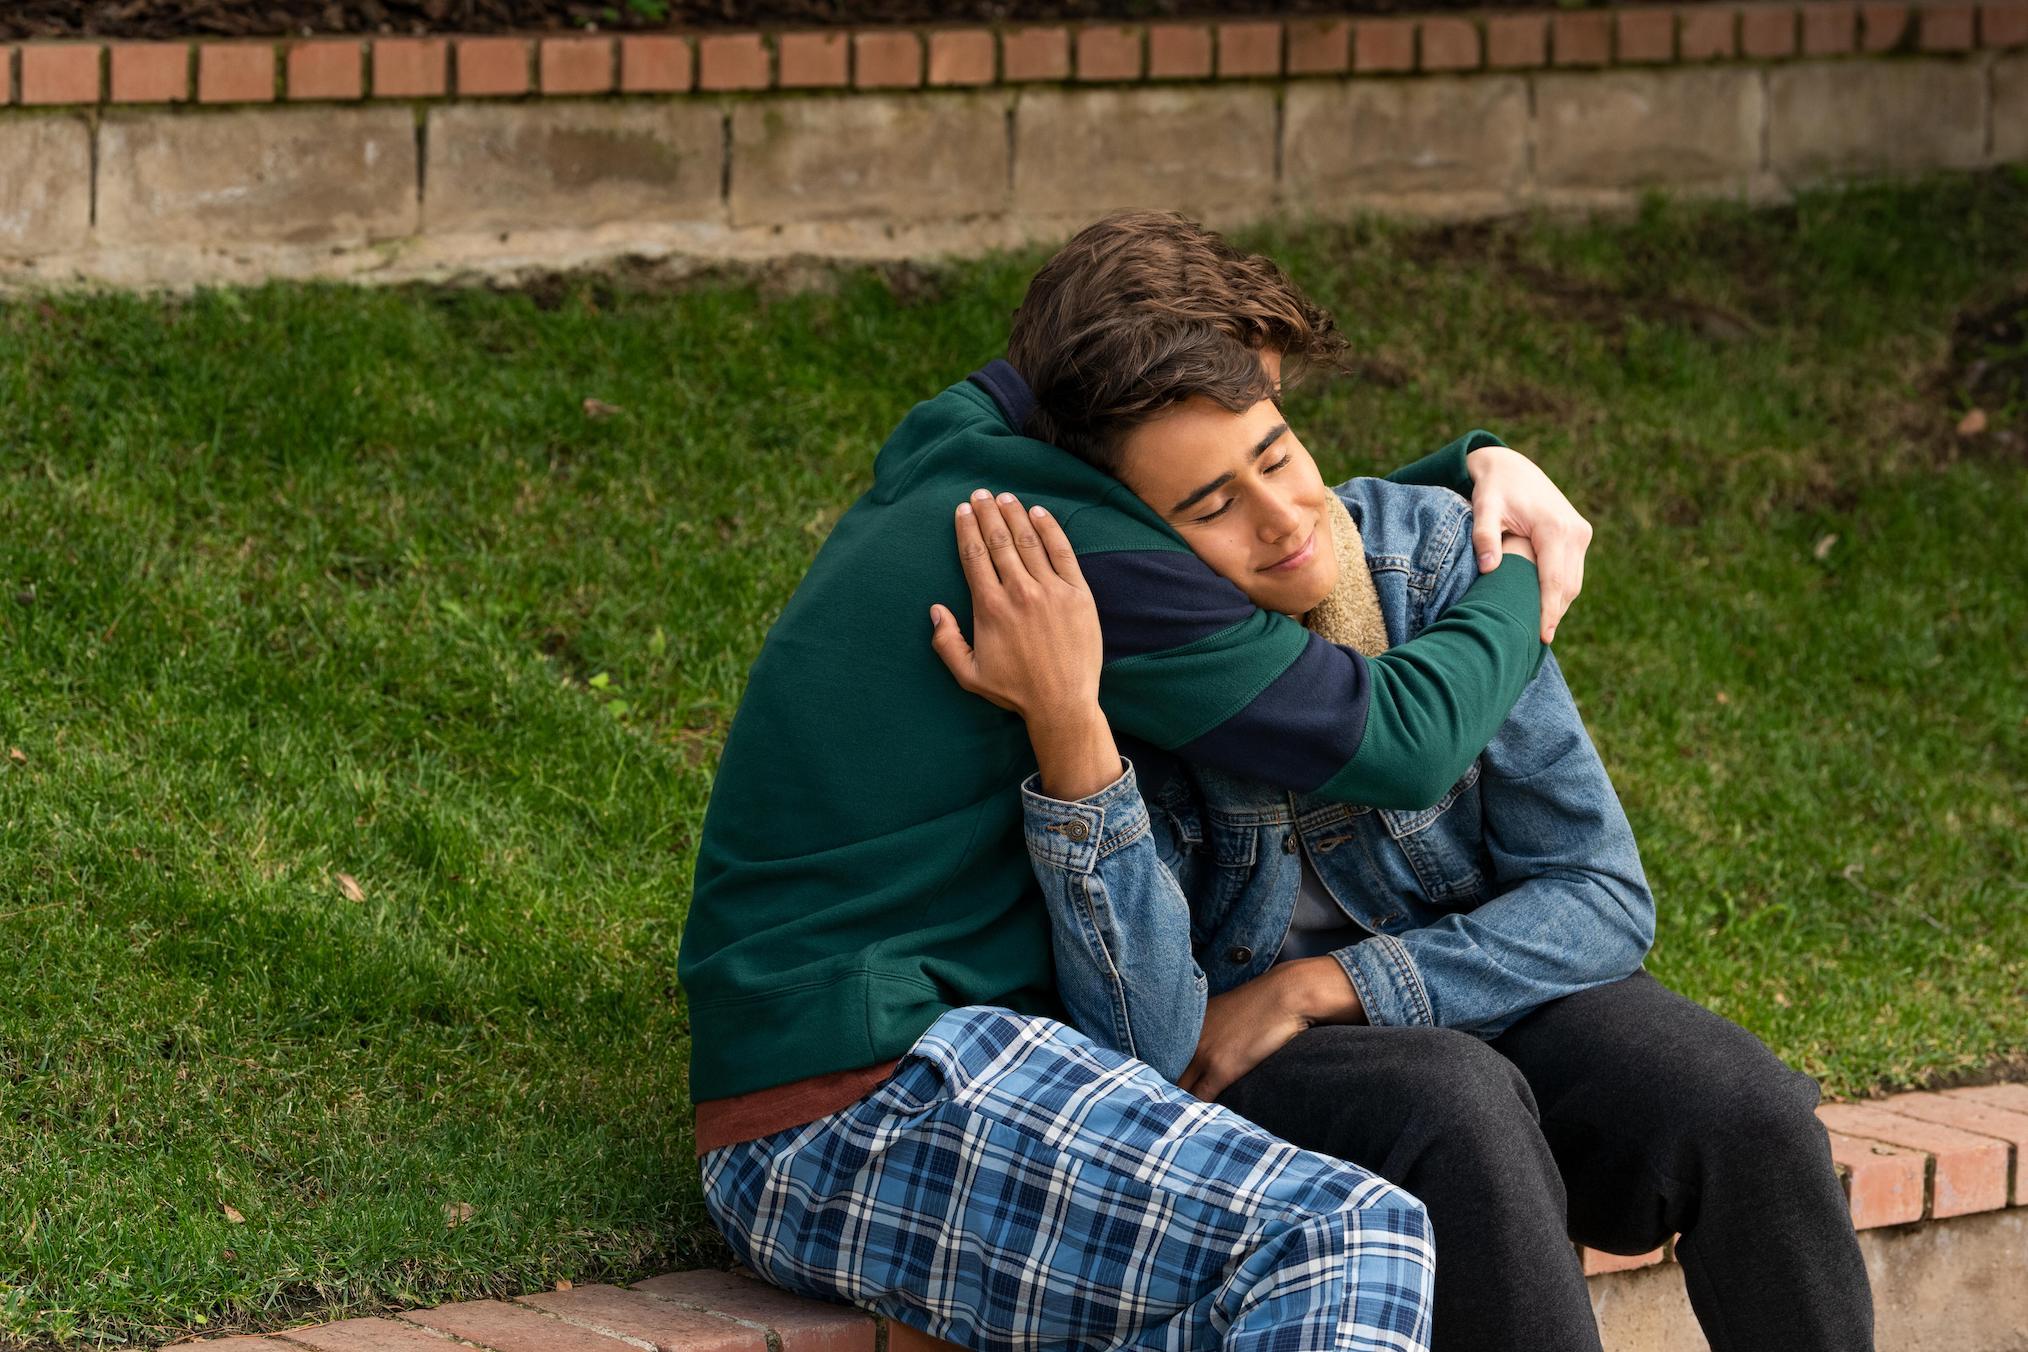 Felix (Anthony Turpel) e Victor (Michael Cimino) em Love, Victor